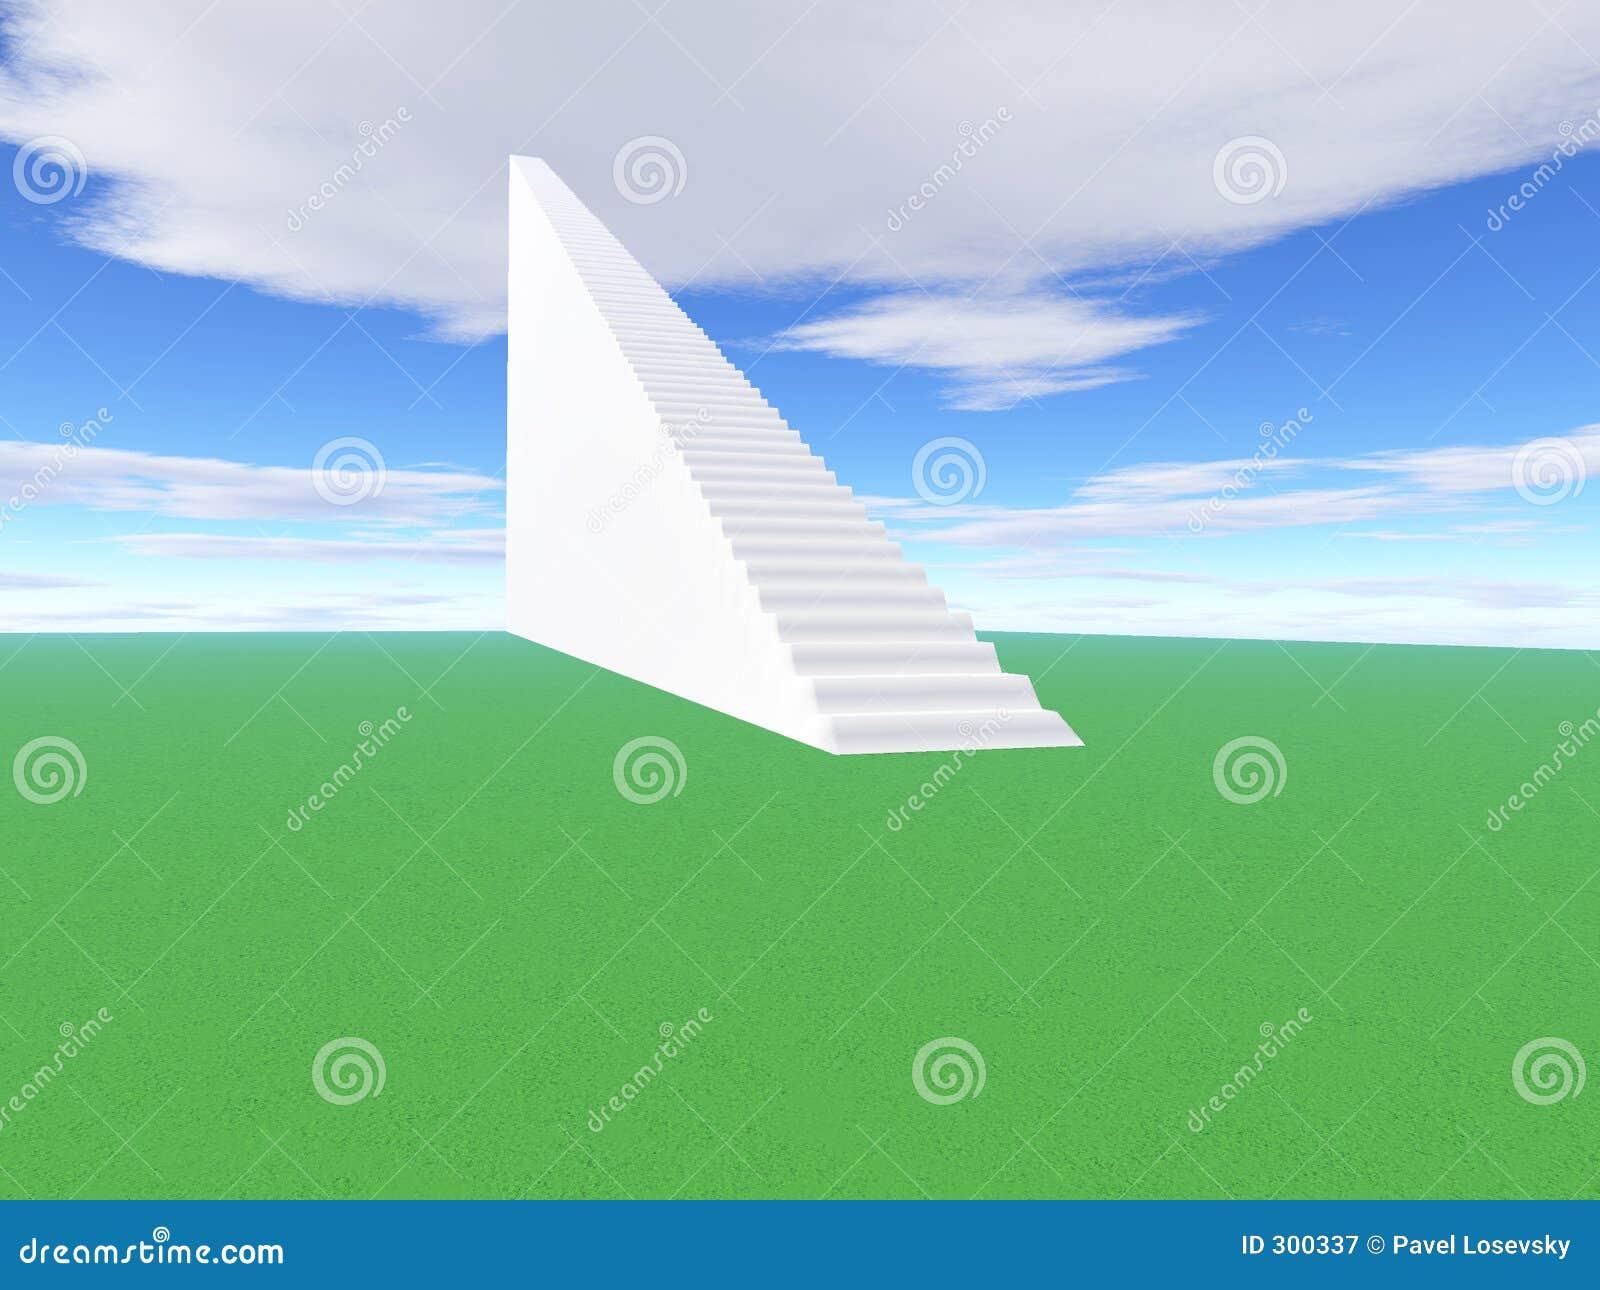 Escalera a subir al éxito